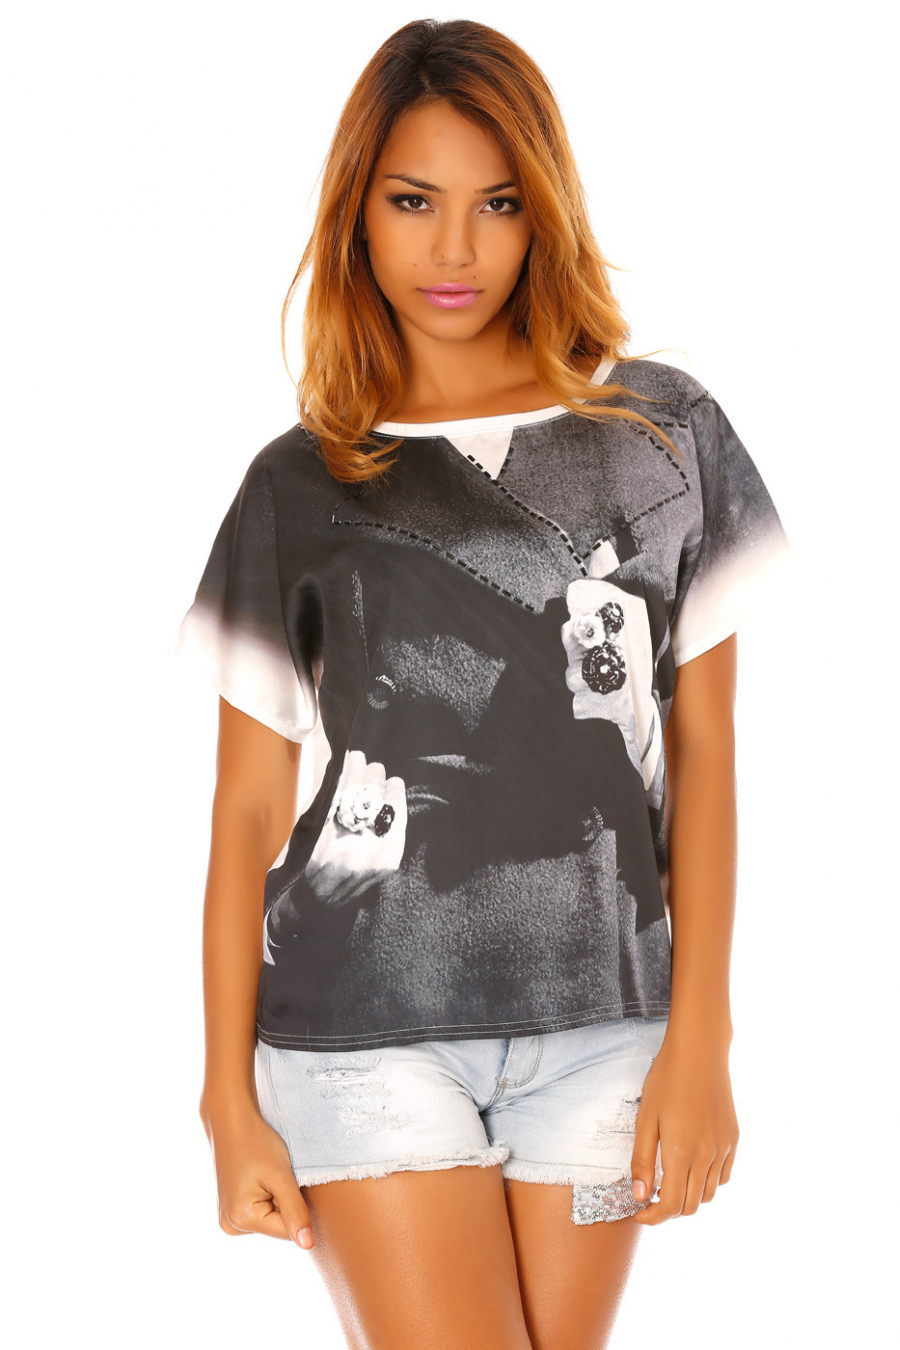 White satin t-shirt printed with black rings and rhinestones. MC918